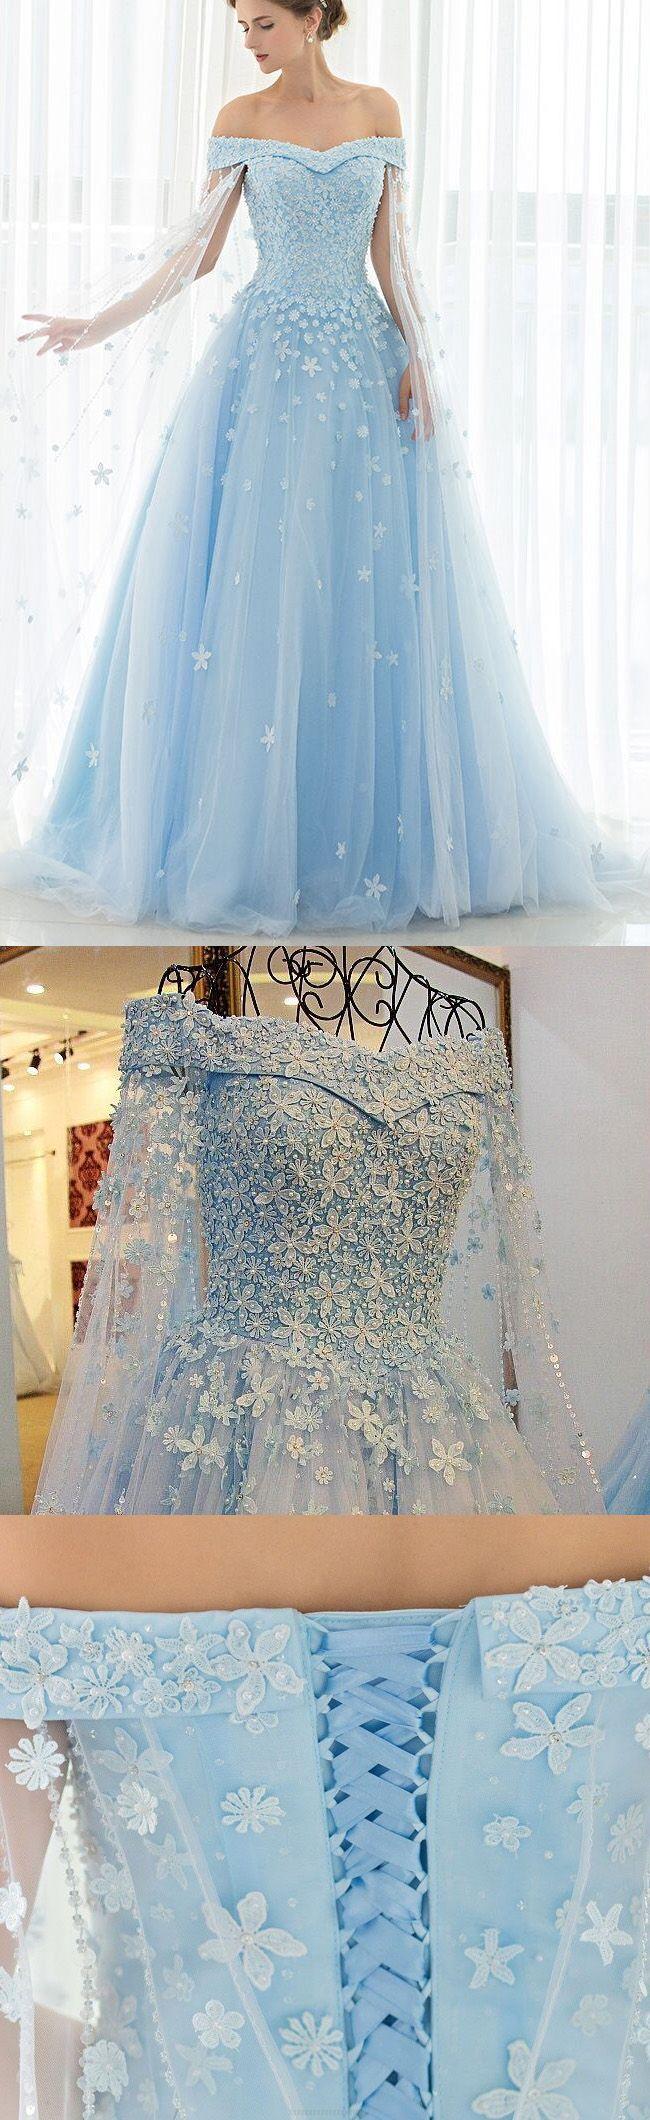 Light Blue dresses, Long Evening Dresses, Sexy Long Dresses, Sexy Evening Dresses, Long Blue dresses, Sexy Blue Dresses, A-line Evening Dresses, Light Blue Evening Dresses, Sleeveless Evening Dresses